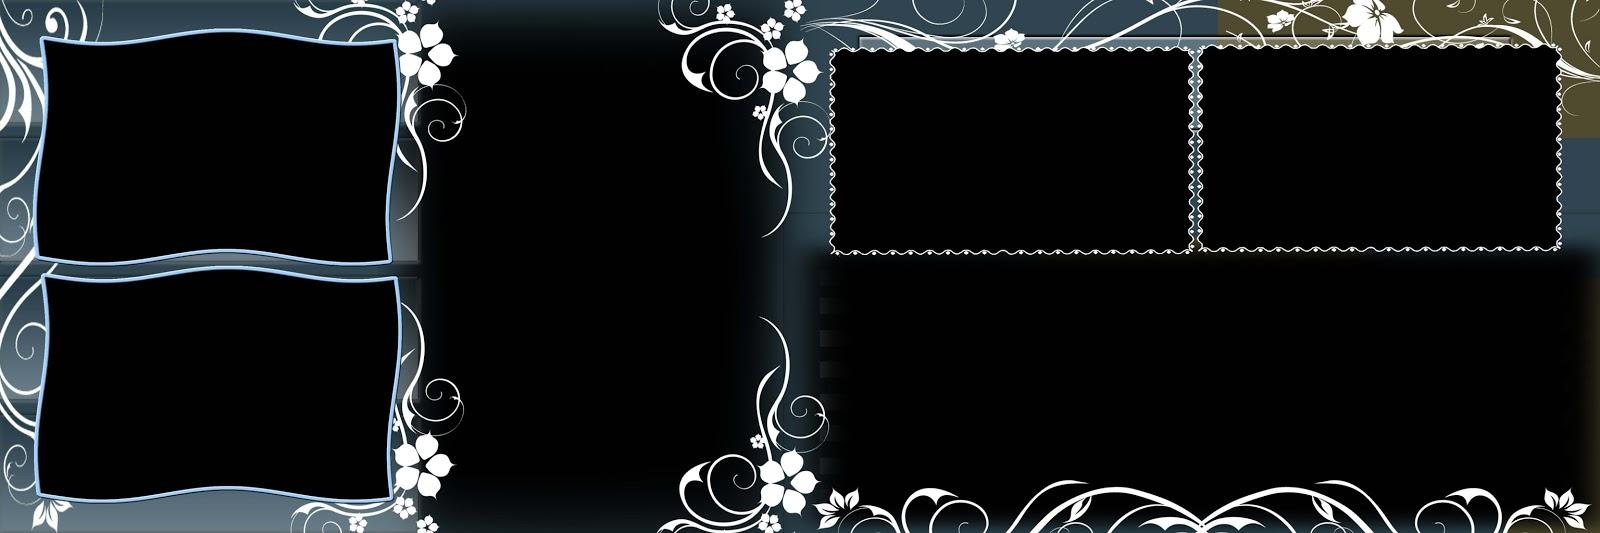 wedding album design 12x36 psd templates vol-01 free download